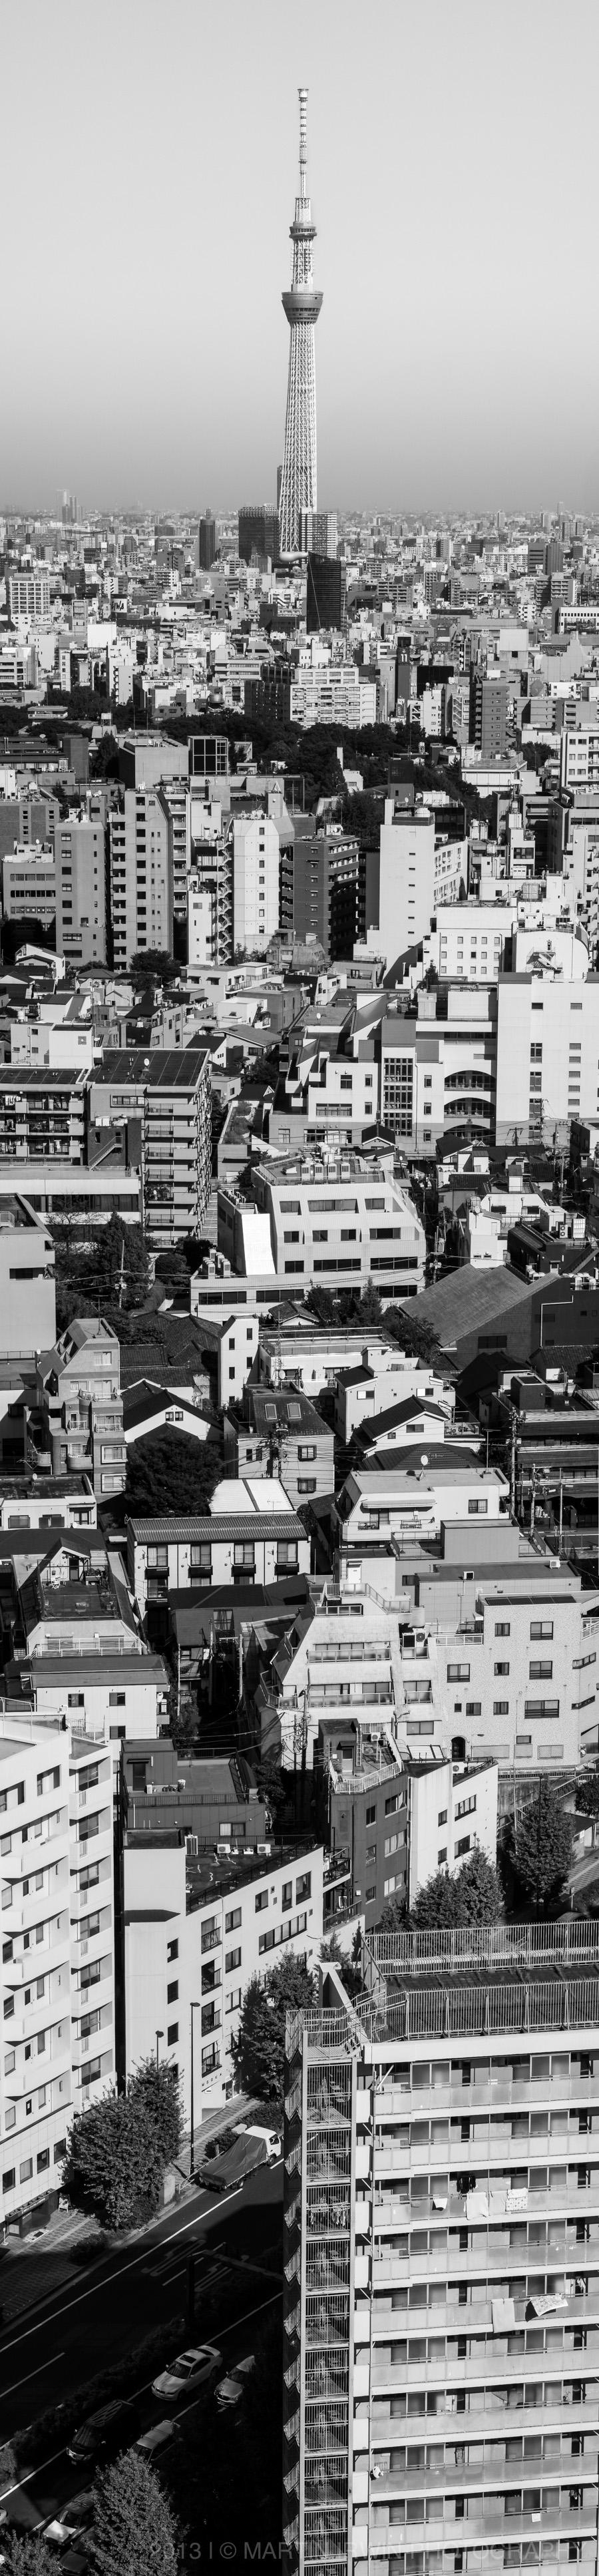 Tokyo Skytree | NEX-7 & Tamron SP 90mm F2.8 Macro | 1/500s ISO100 f/8 90mm